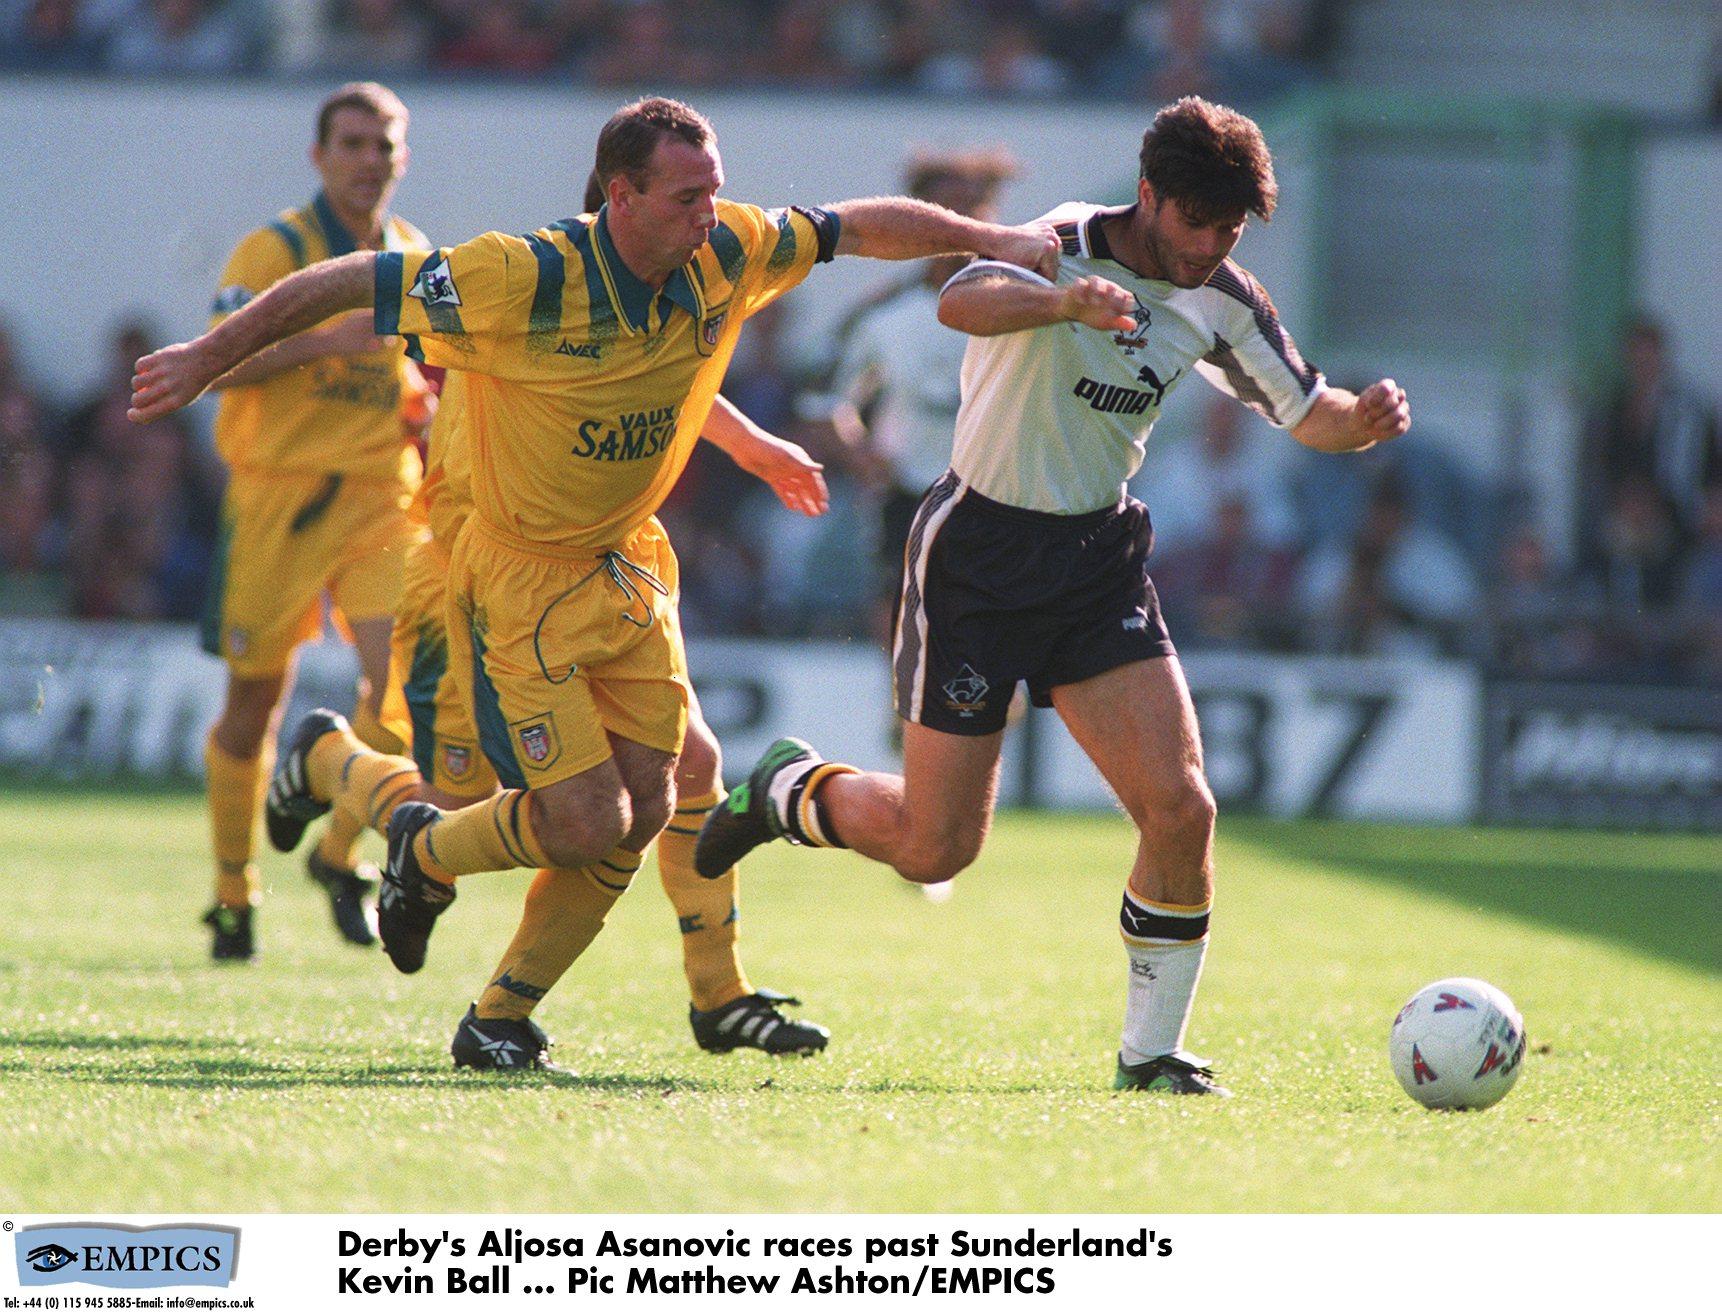 Soccer - Derby County v Sunderland